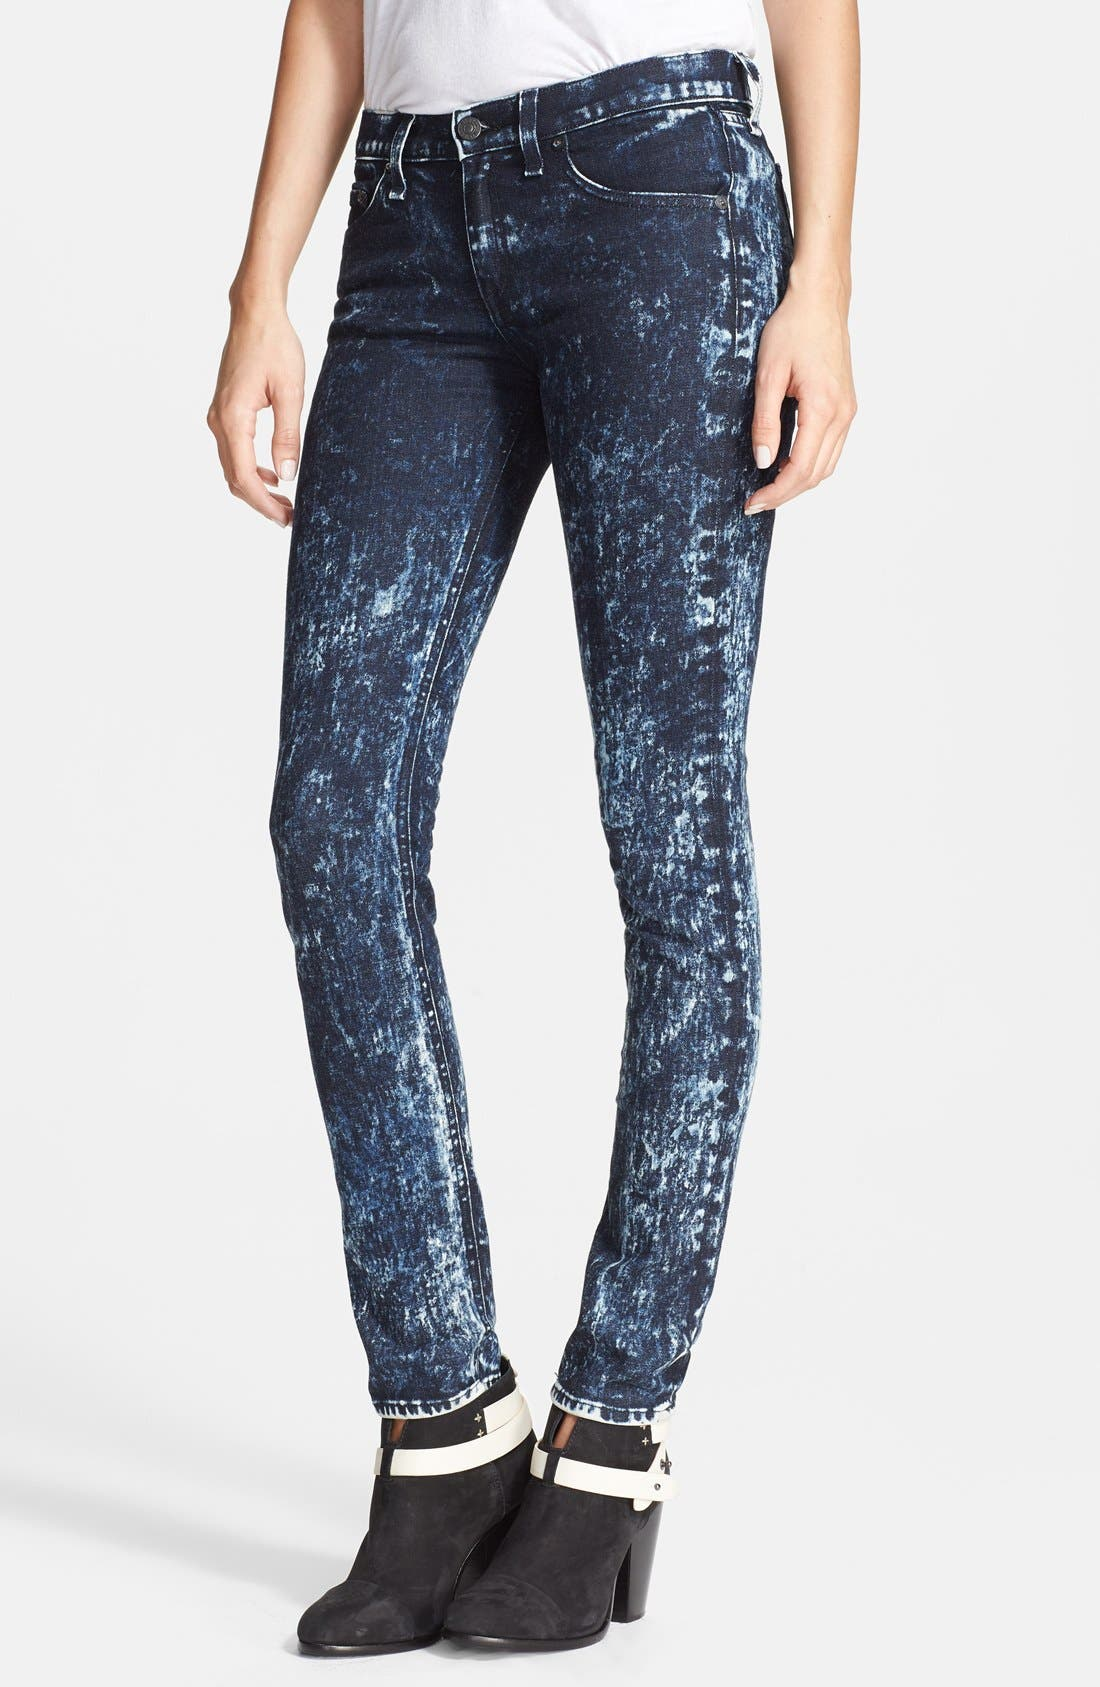 Main Image - rag & bone/JEAN Stretch Skinny Jeans (Acid Wash/Black/White)